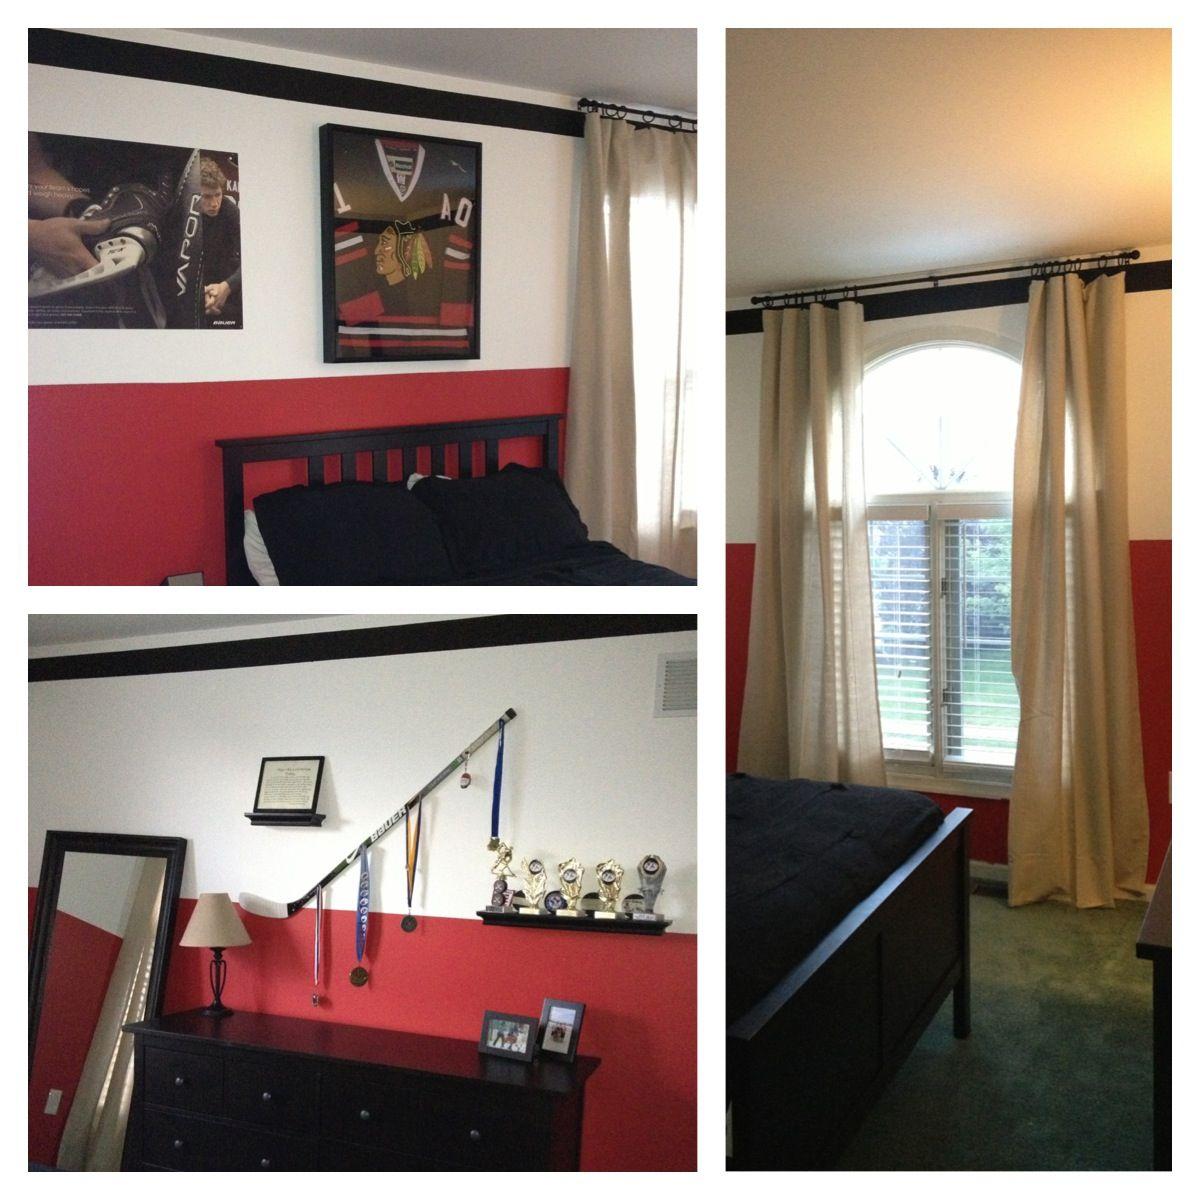 Boys hockey bedroom ideas - Hockey Bedroom Hockey Bedroomhockey Stuffroom Decorationsboy